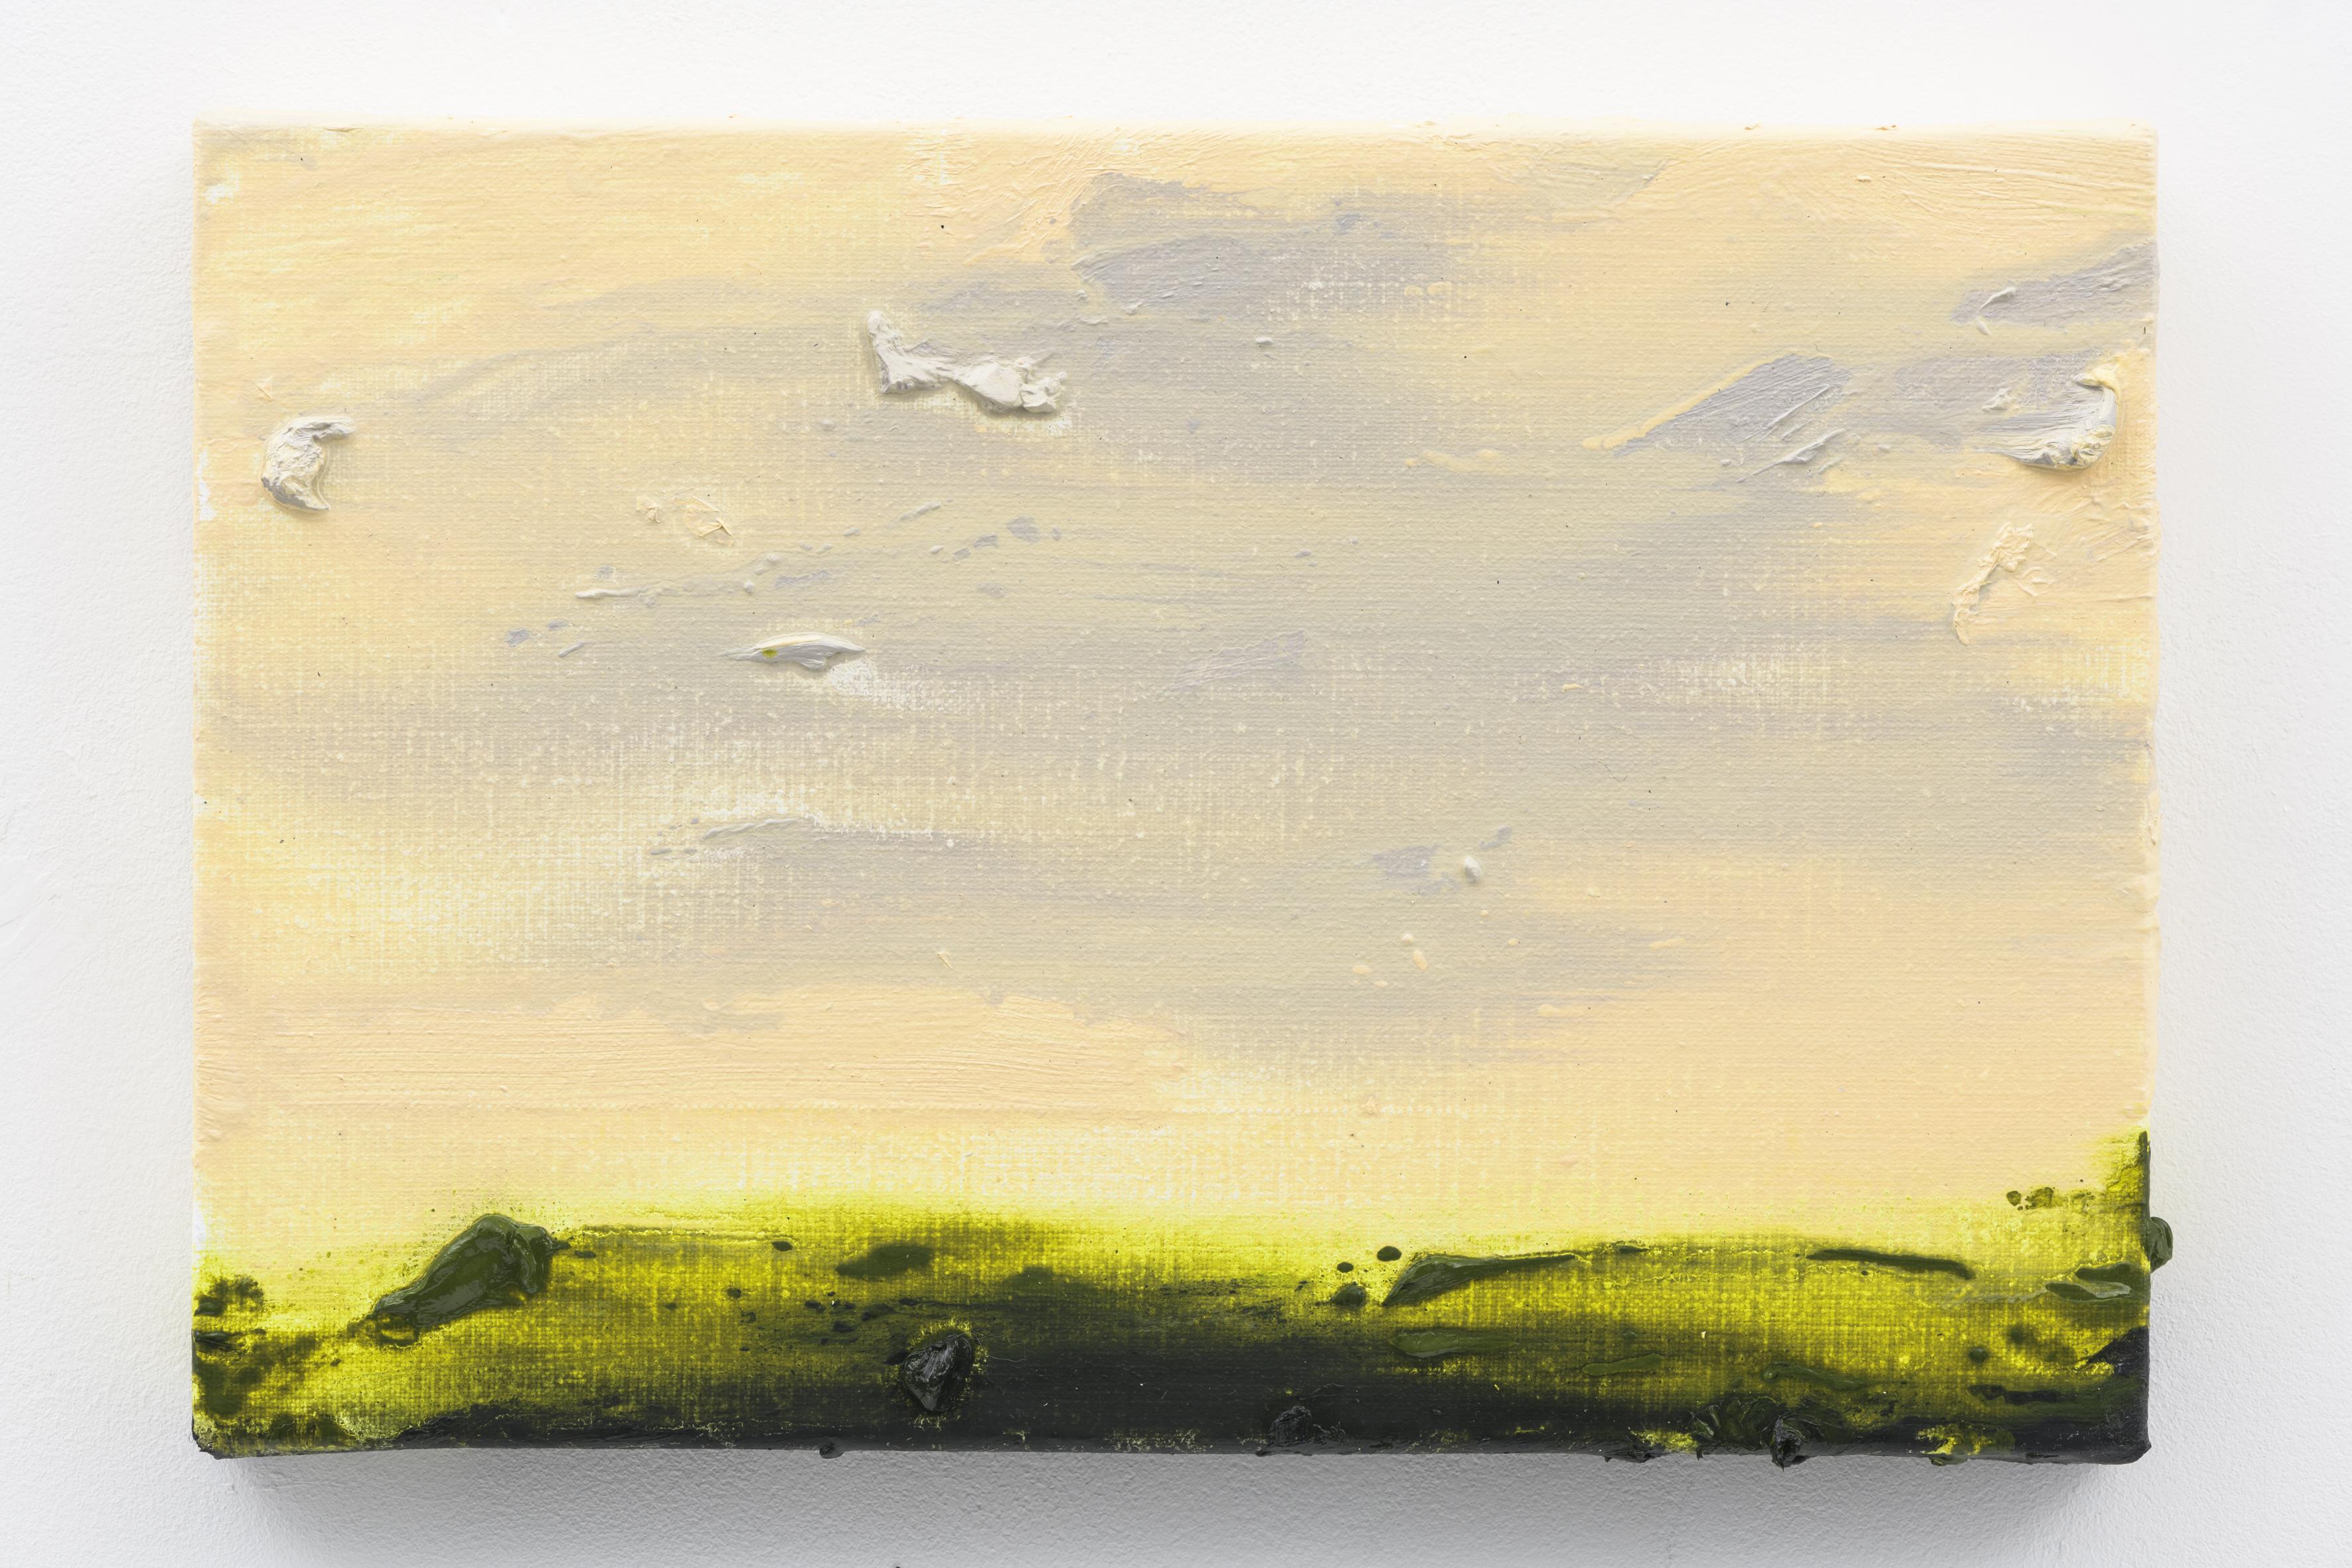 """Herfstlicht I"" 20 x 30 cm. oil on linen 2017 (Air Van GoghHuis)"